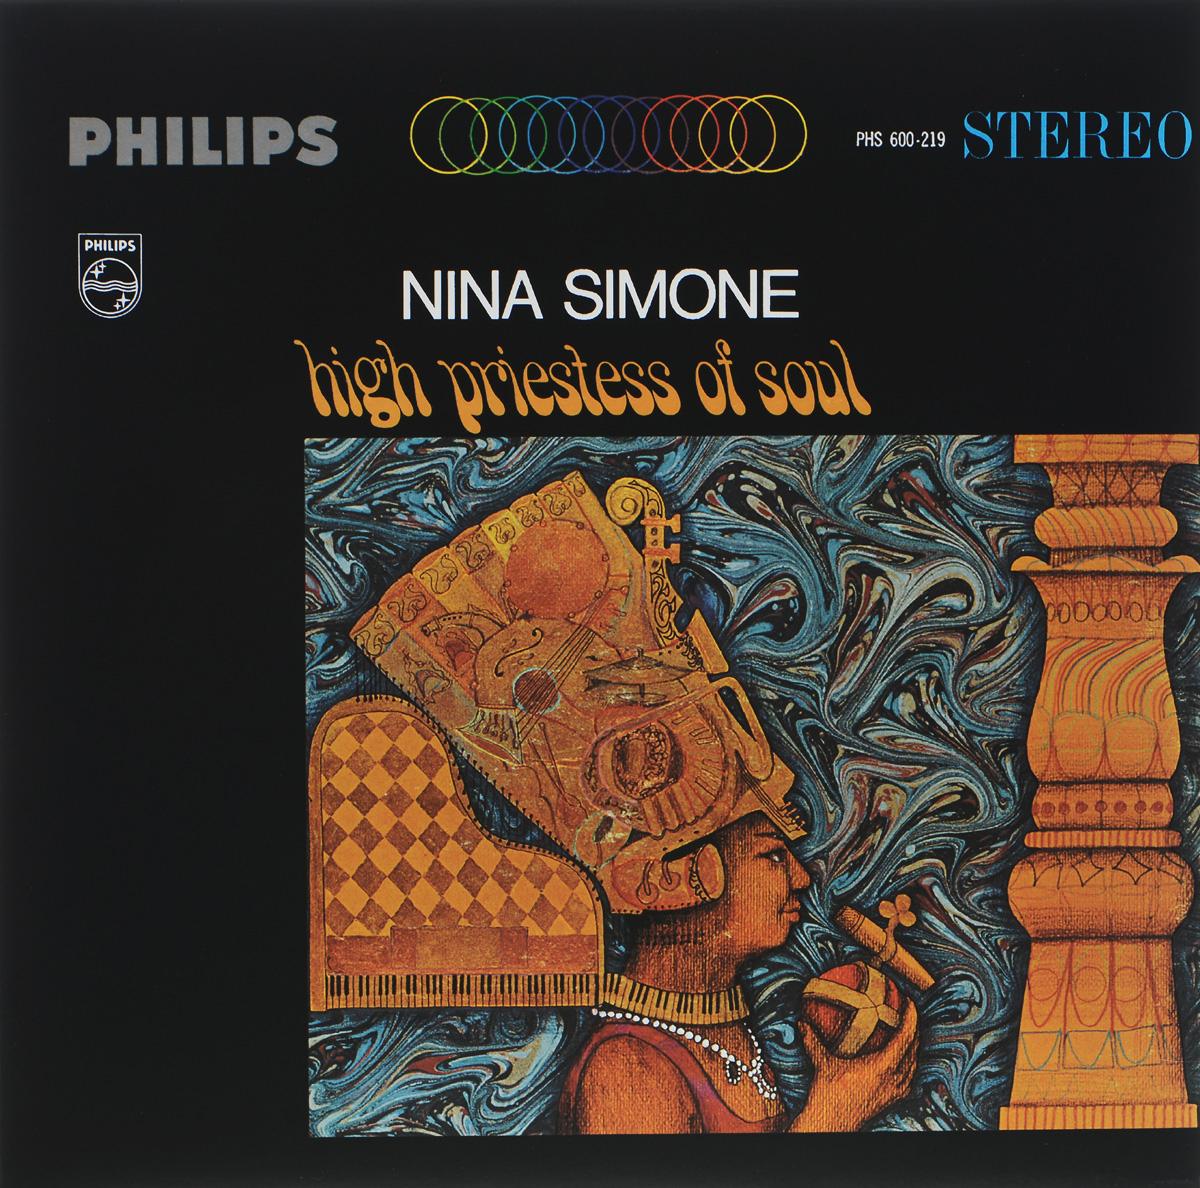 лучшая цена Нина Симон Nina Simone. High Priestess Of Soul (LP)